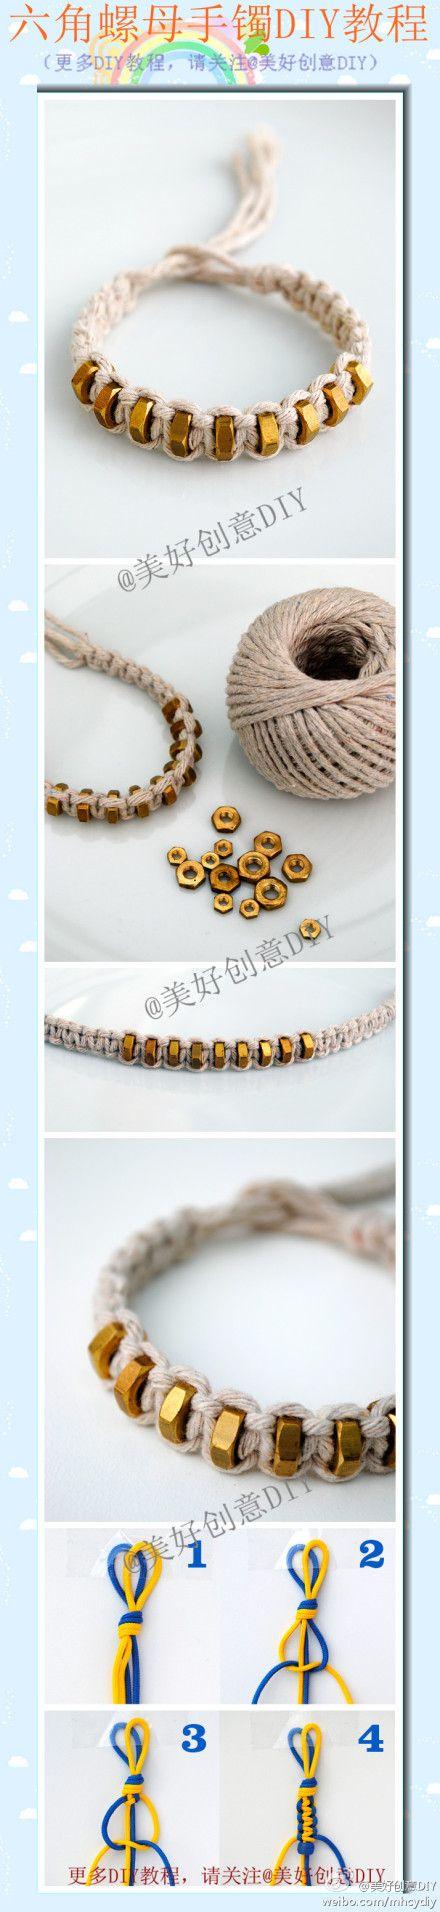 Hexagonal nut bracelet DIY tutorial, great personality ~ ~ fast to do a try!